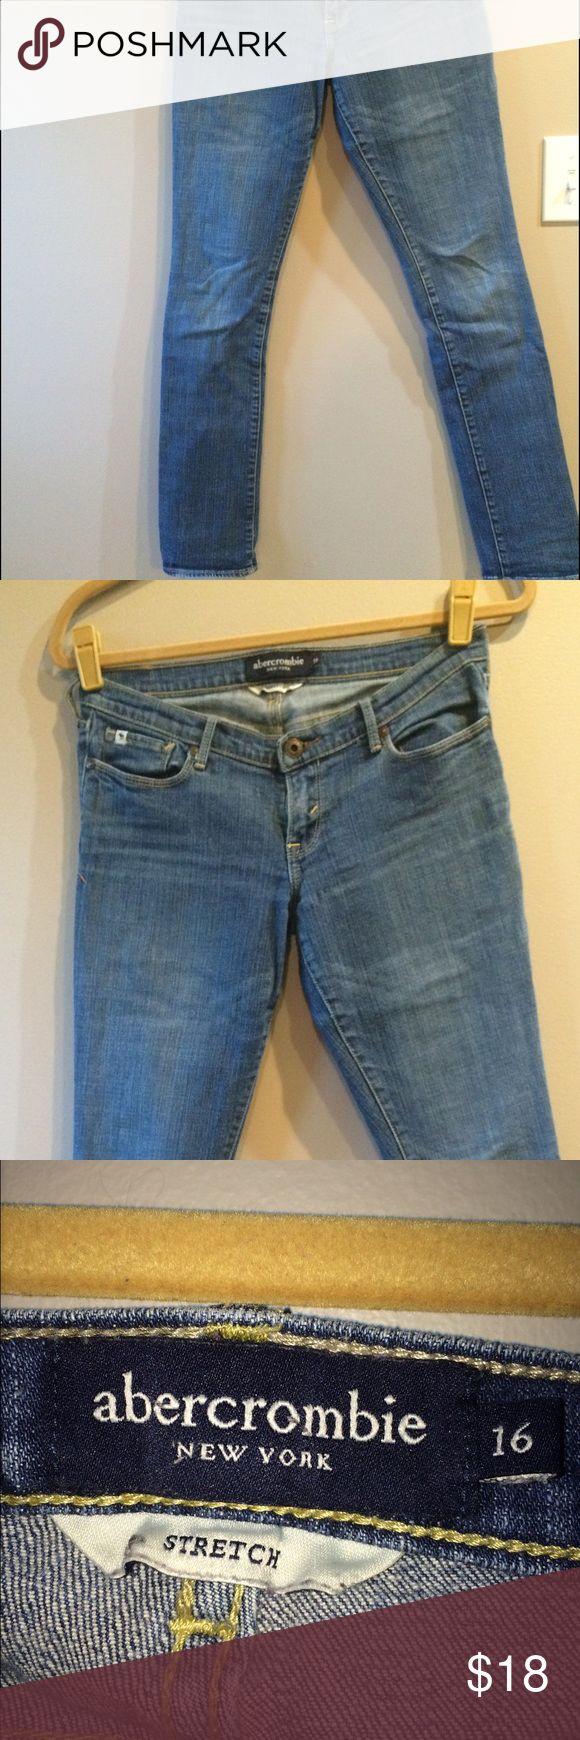 Abercrombie girls skinny jeans Girls Abercrombie kids skinny jeans abercrombie kids Bottoms Jeans